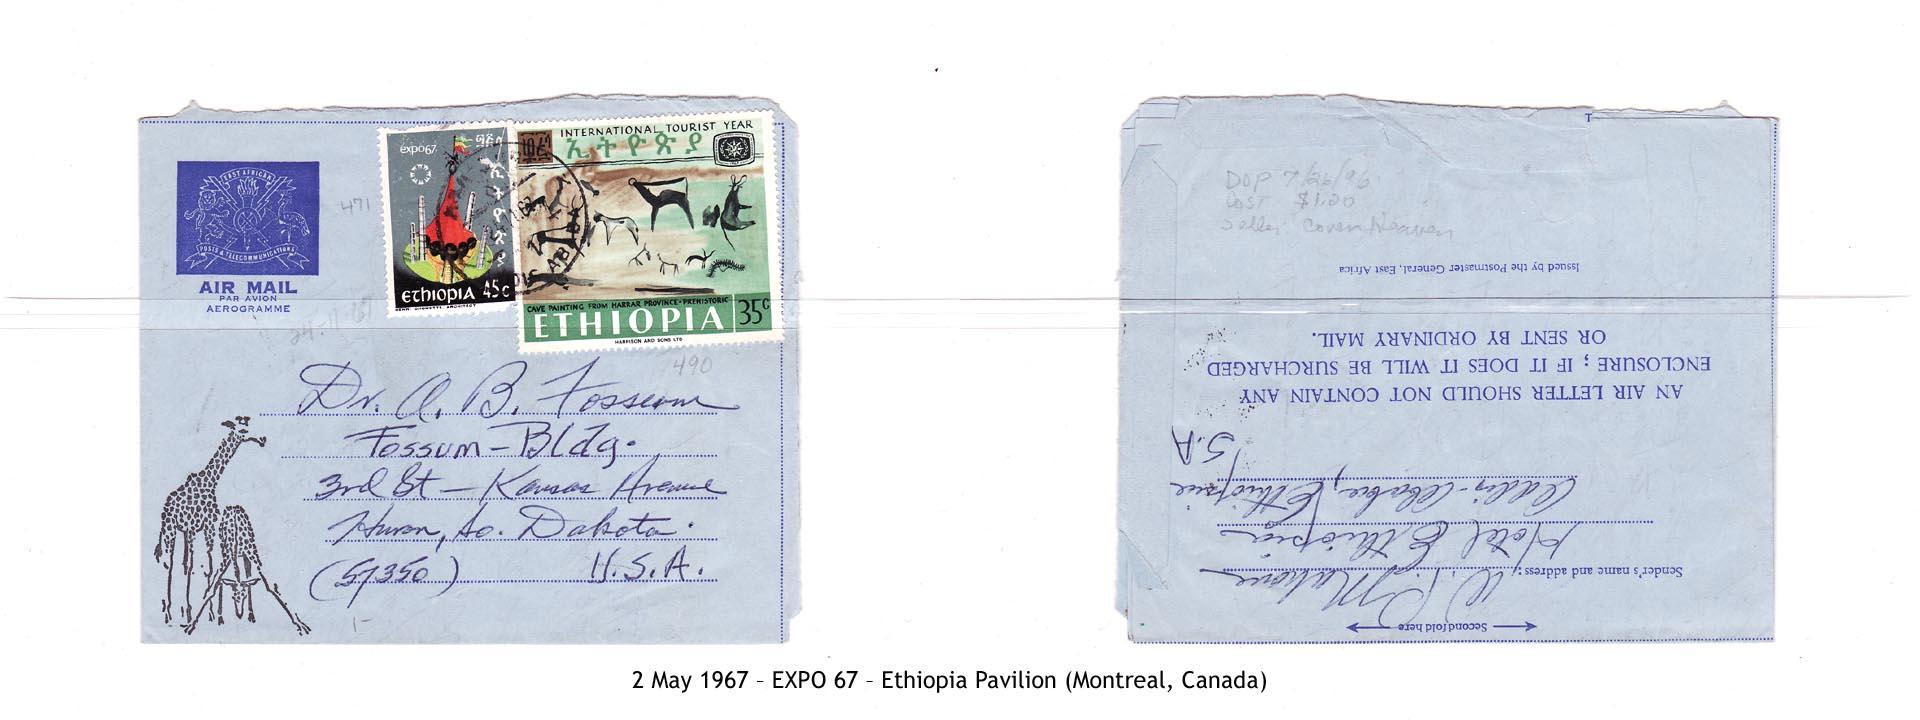 19670502 – EXPO 67 – Ethiopia Pavilion (Montreal, Canada)